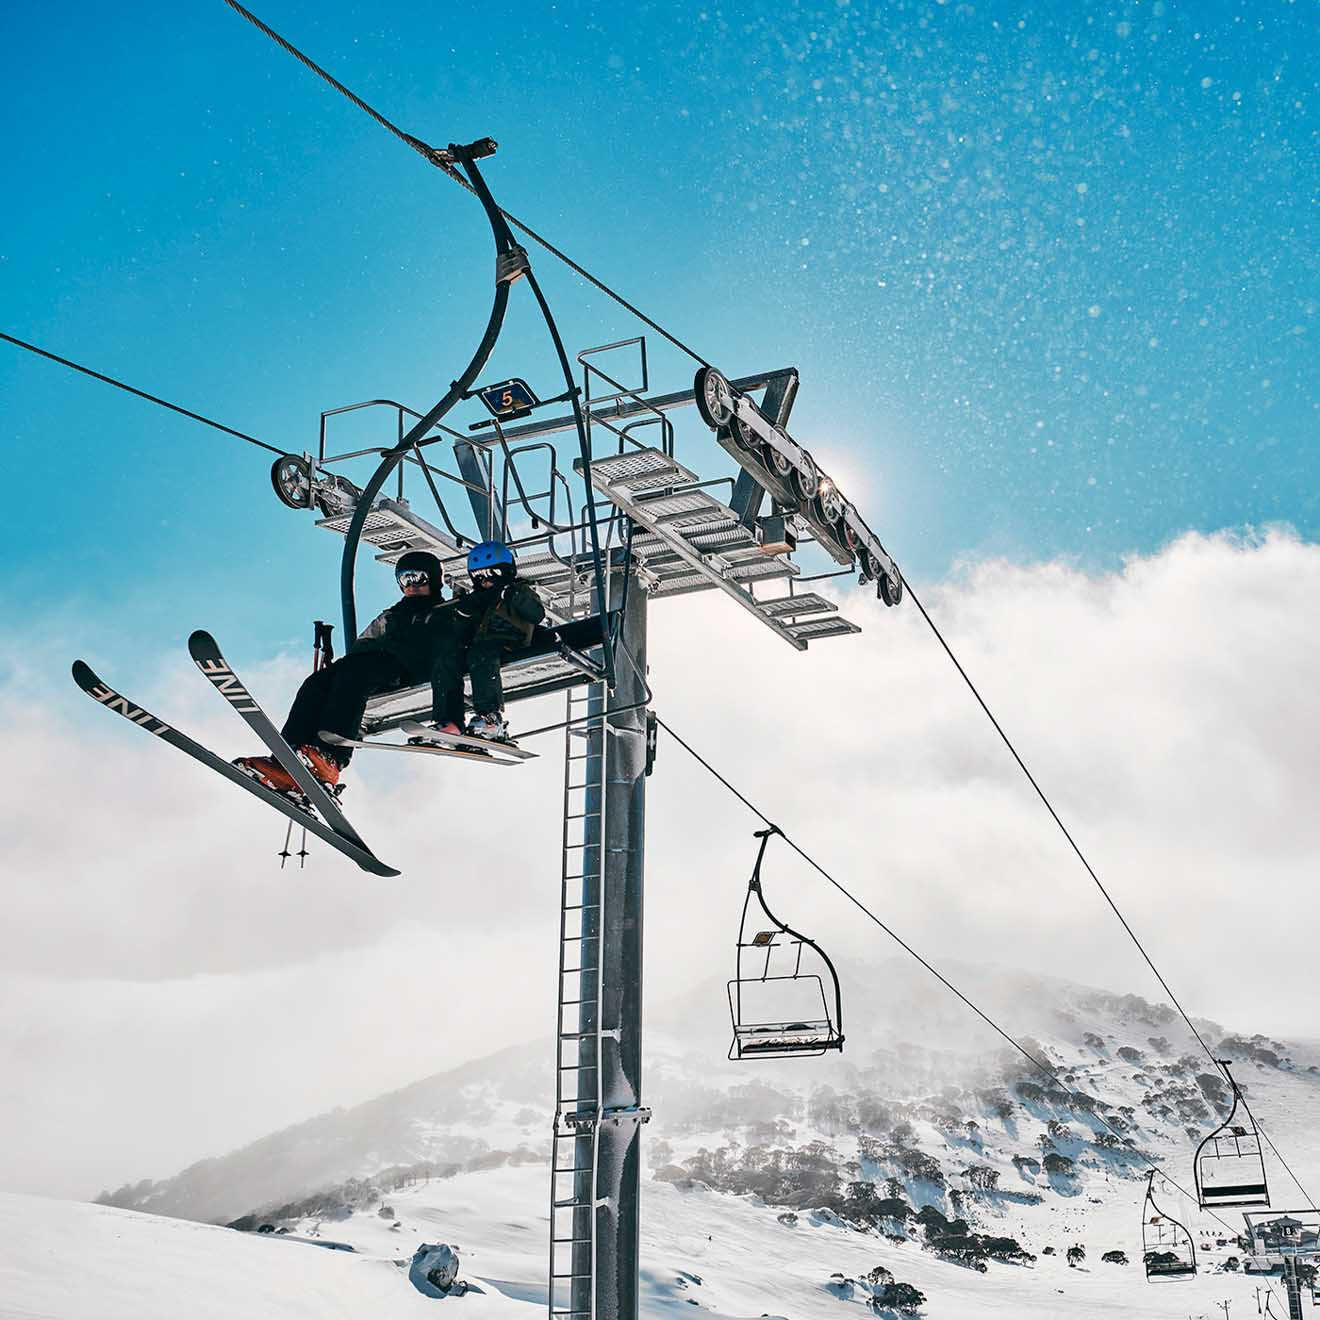 Charlotte Pass Ski Resort Kosciuszko National Park mountains